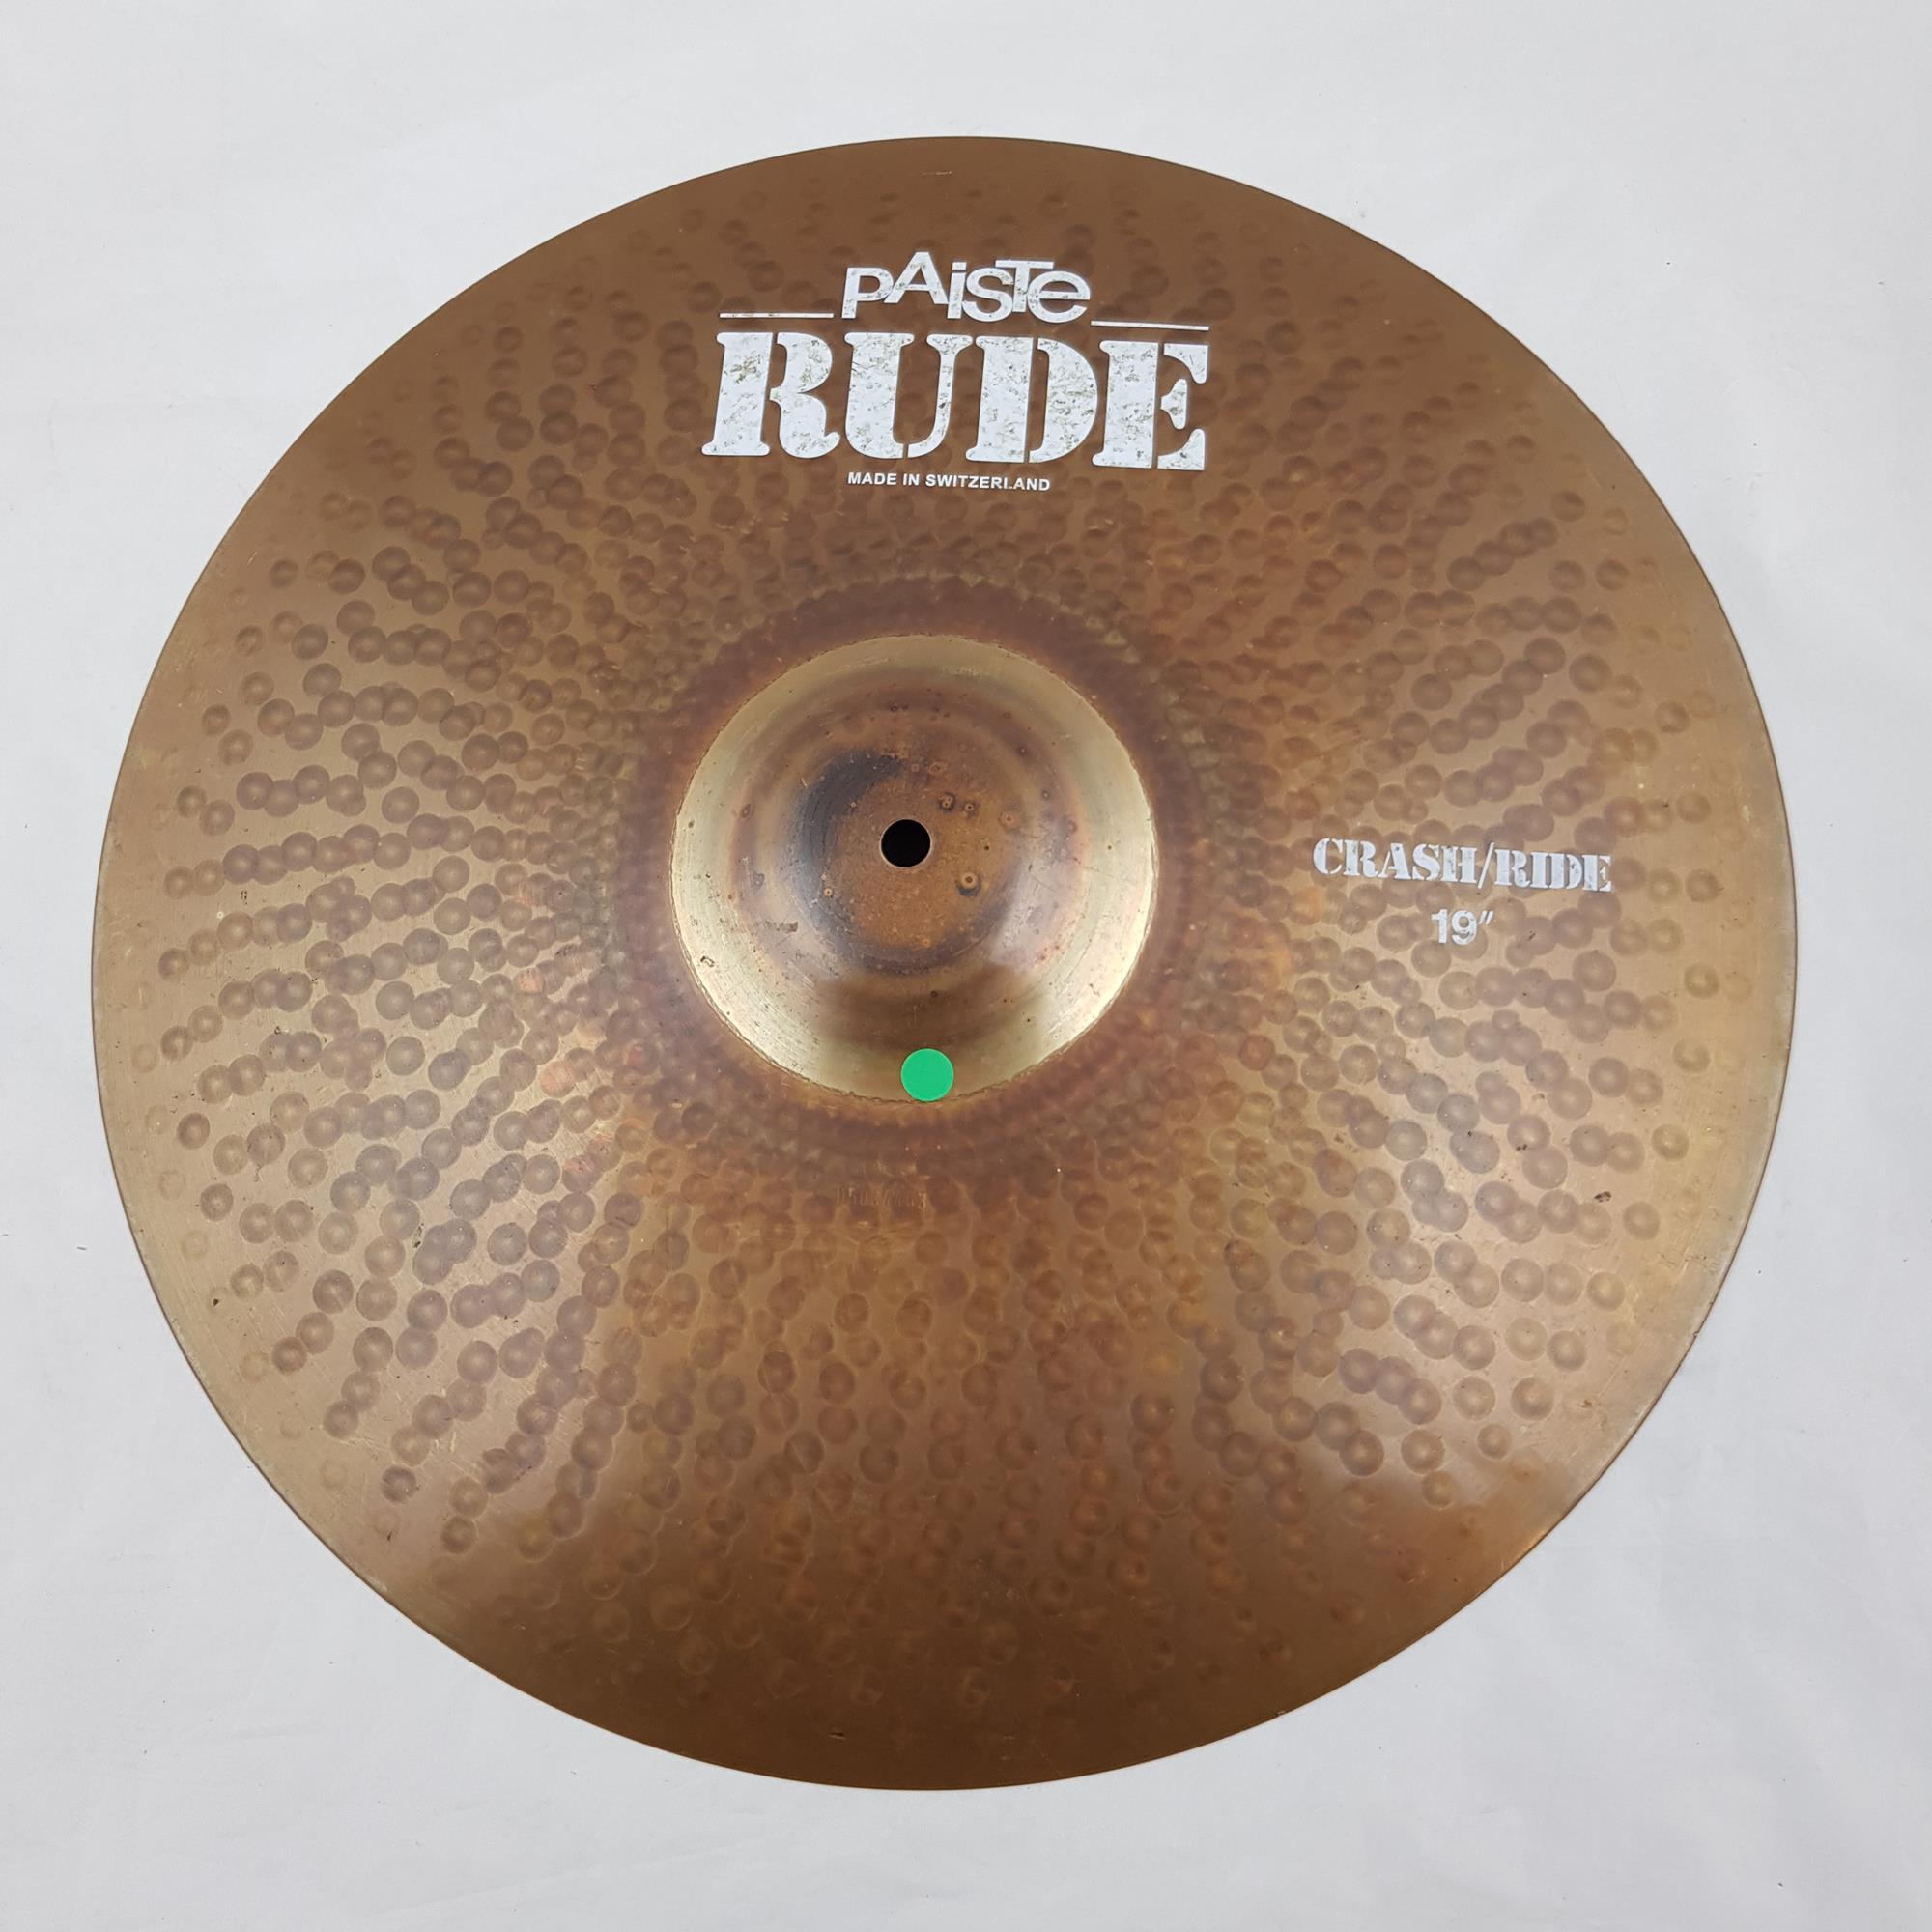 PAISTE-RUDE-CRASH-RIDE-19-sku-1598718059587